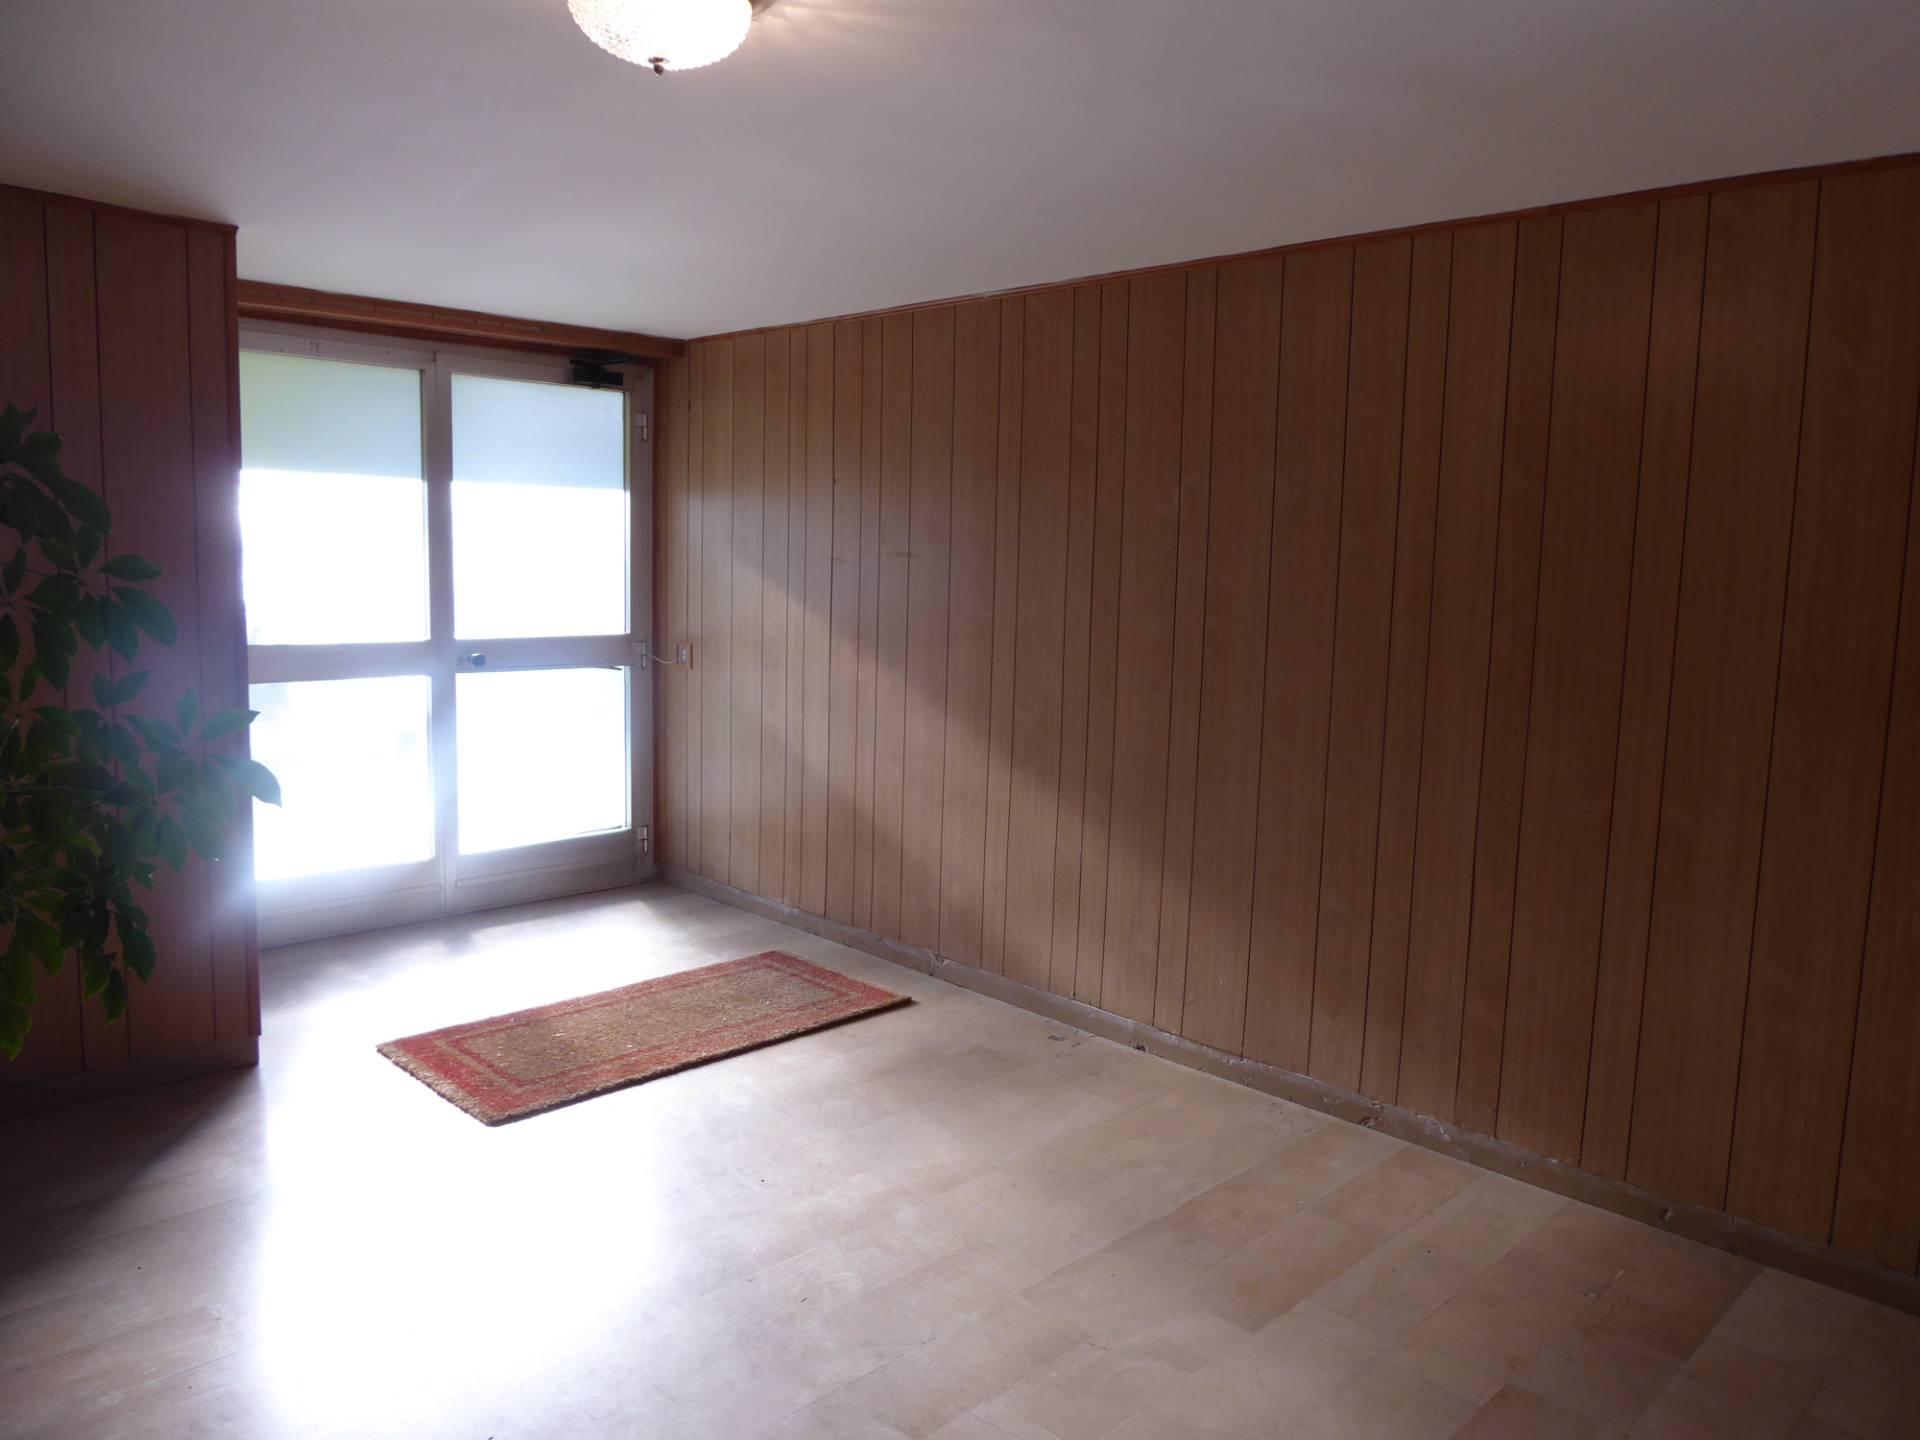 Appartamento PISA vendita  Barbaricina  Ponted